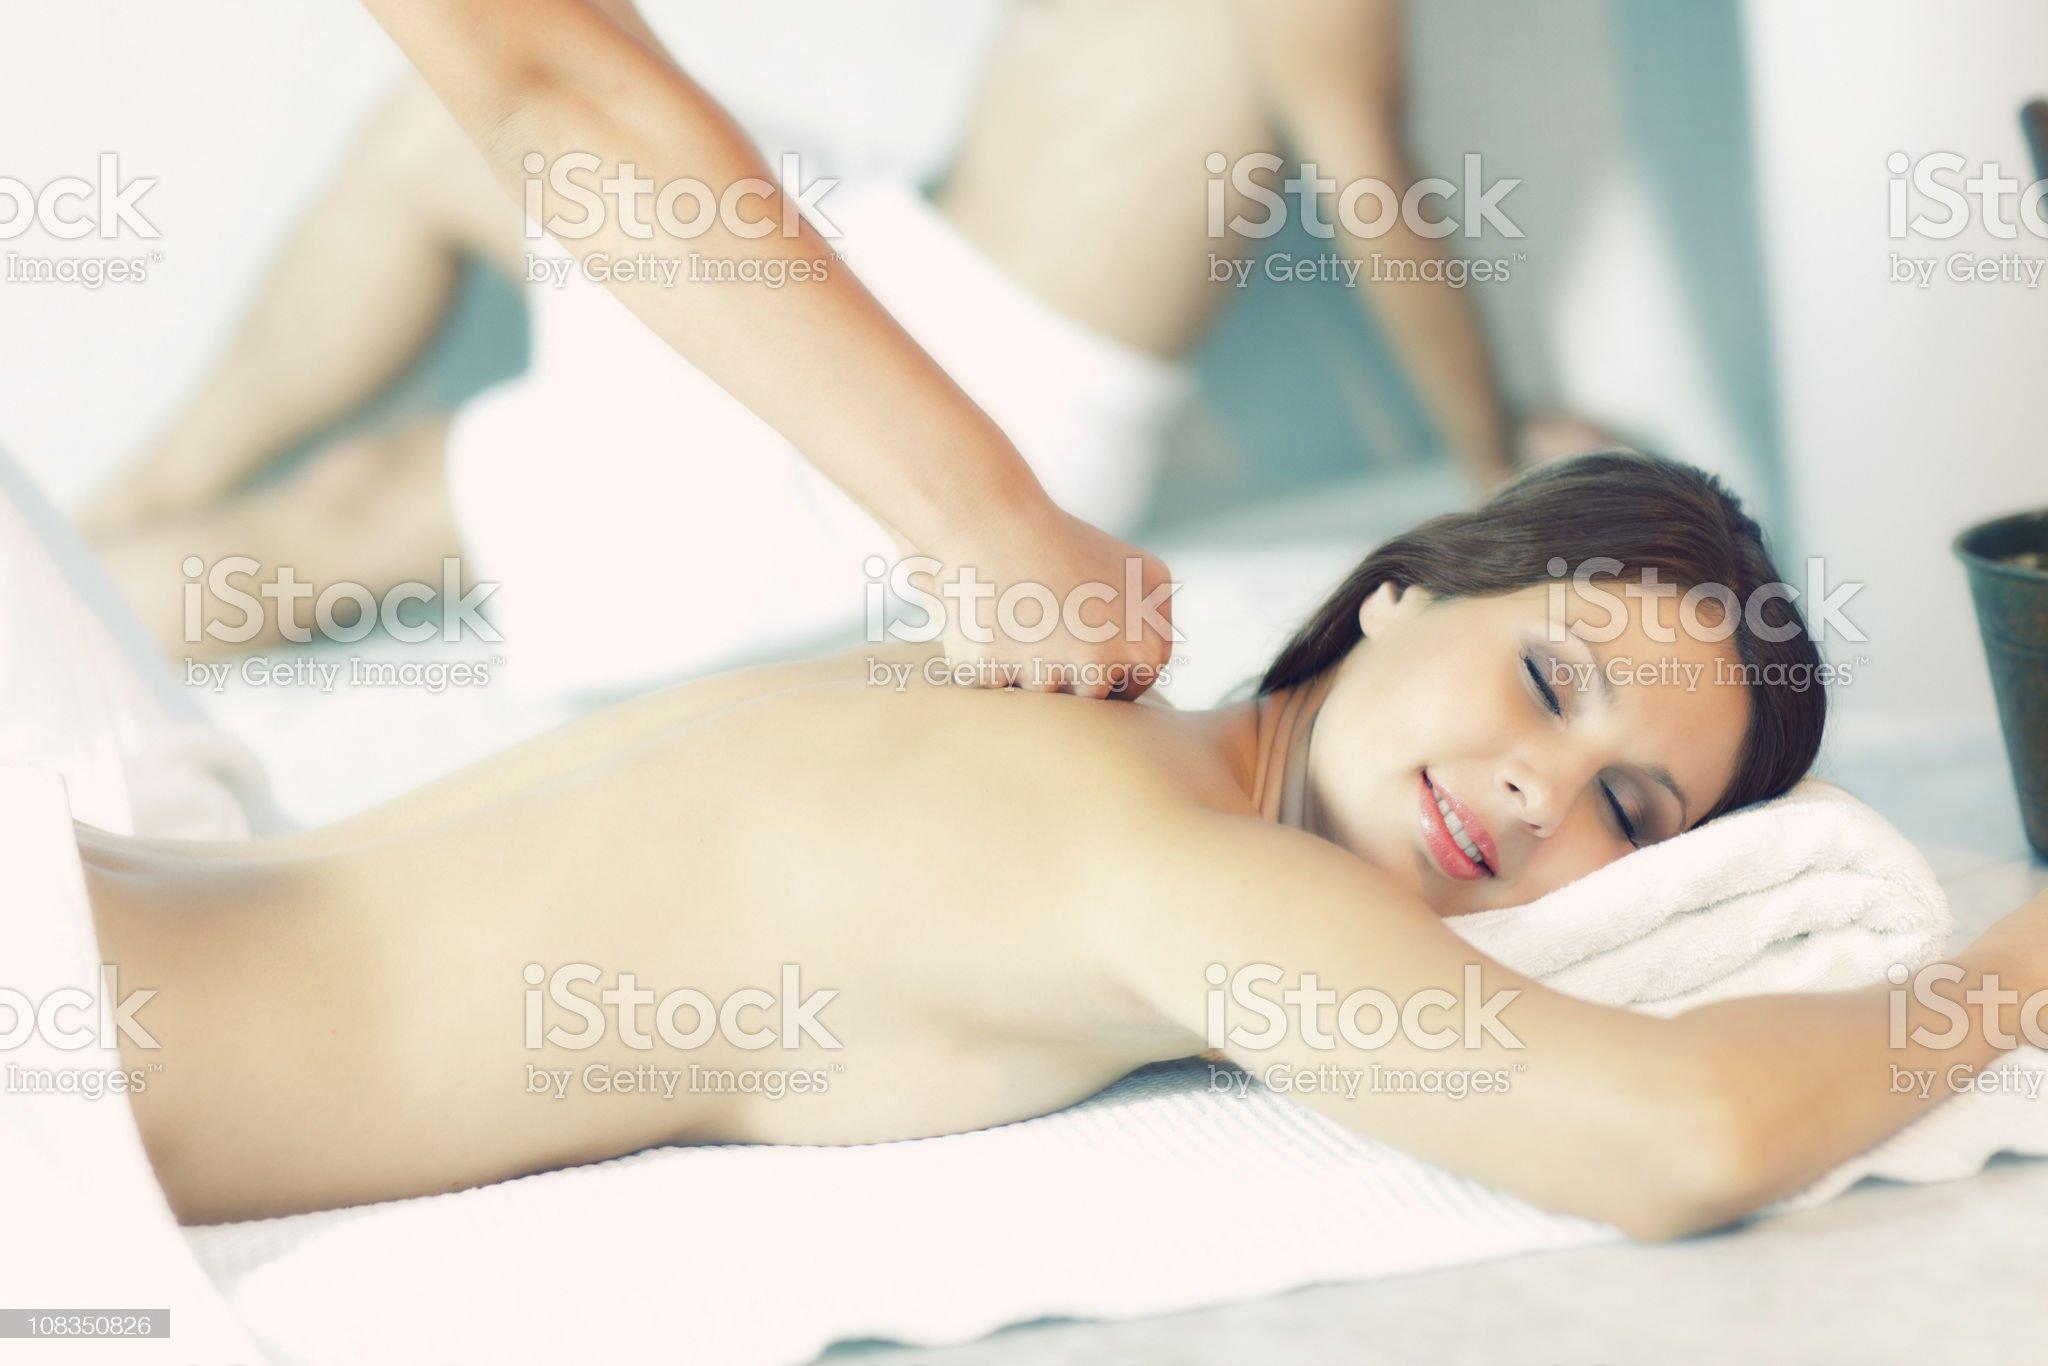 enjoying sauna and masage royalty-free stock photo